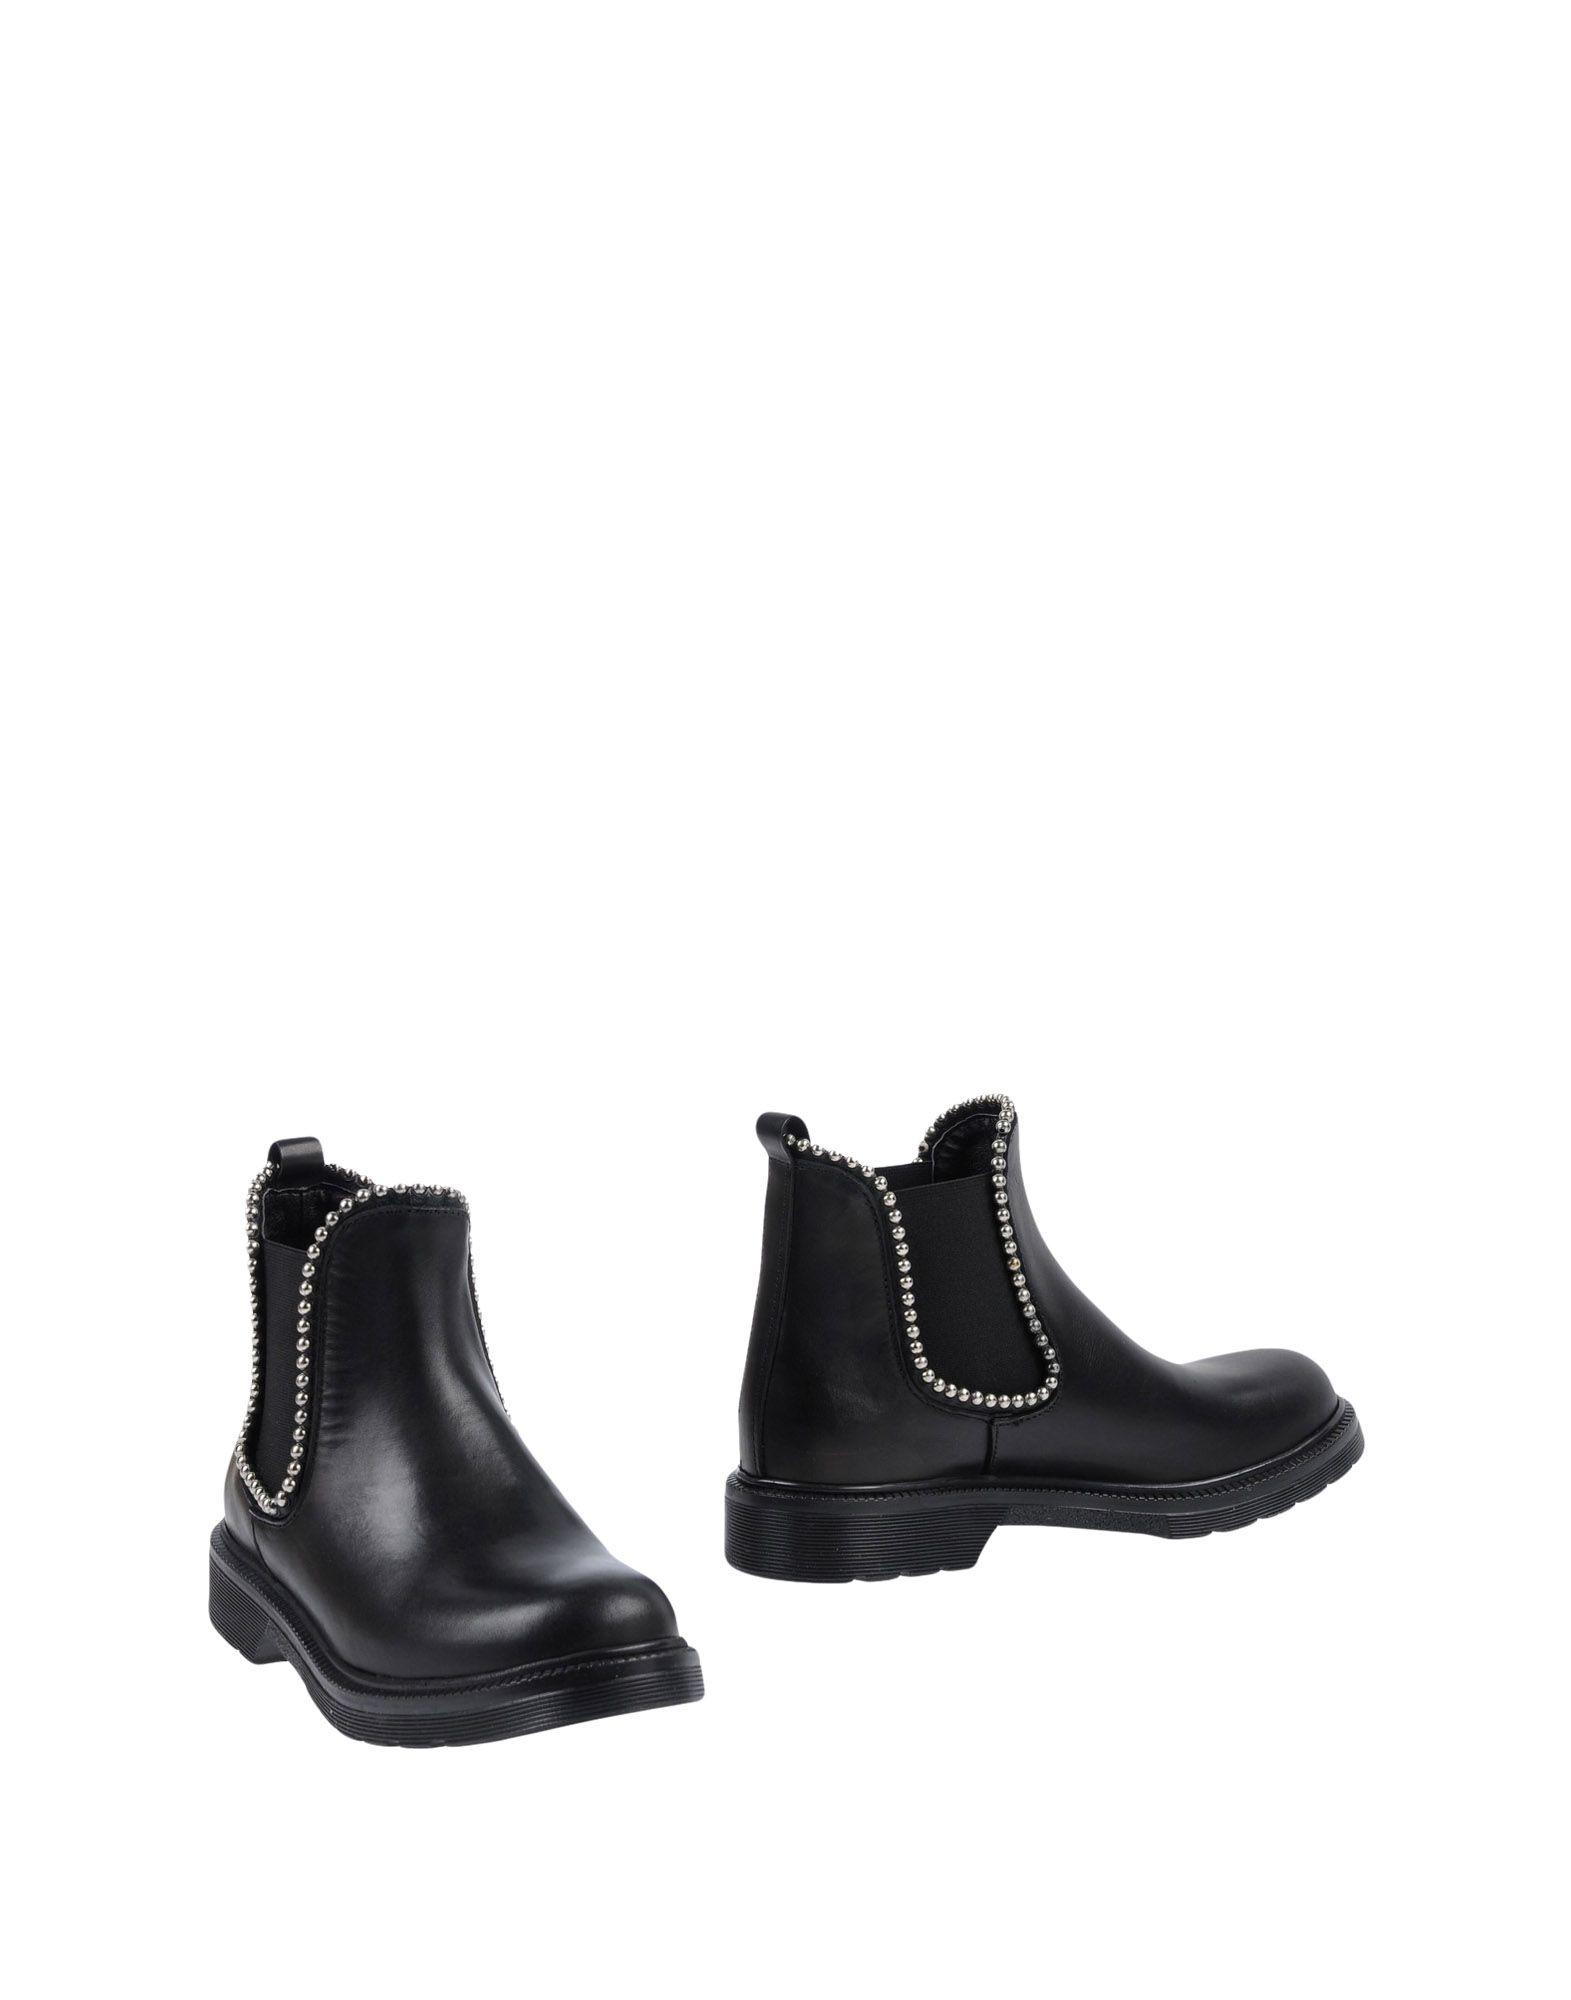 Unlace Chelsea Boots Qualität Damen  11471325FG Gute Qualität Boots beliebte Schuhe 7978d2